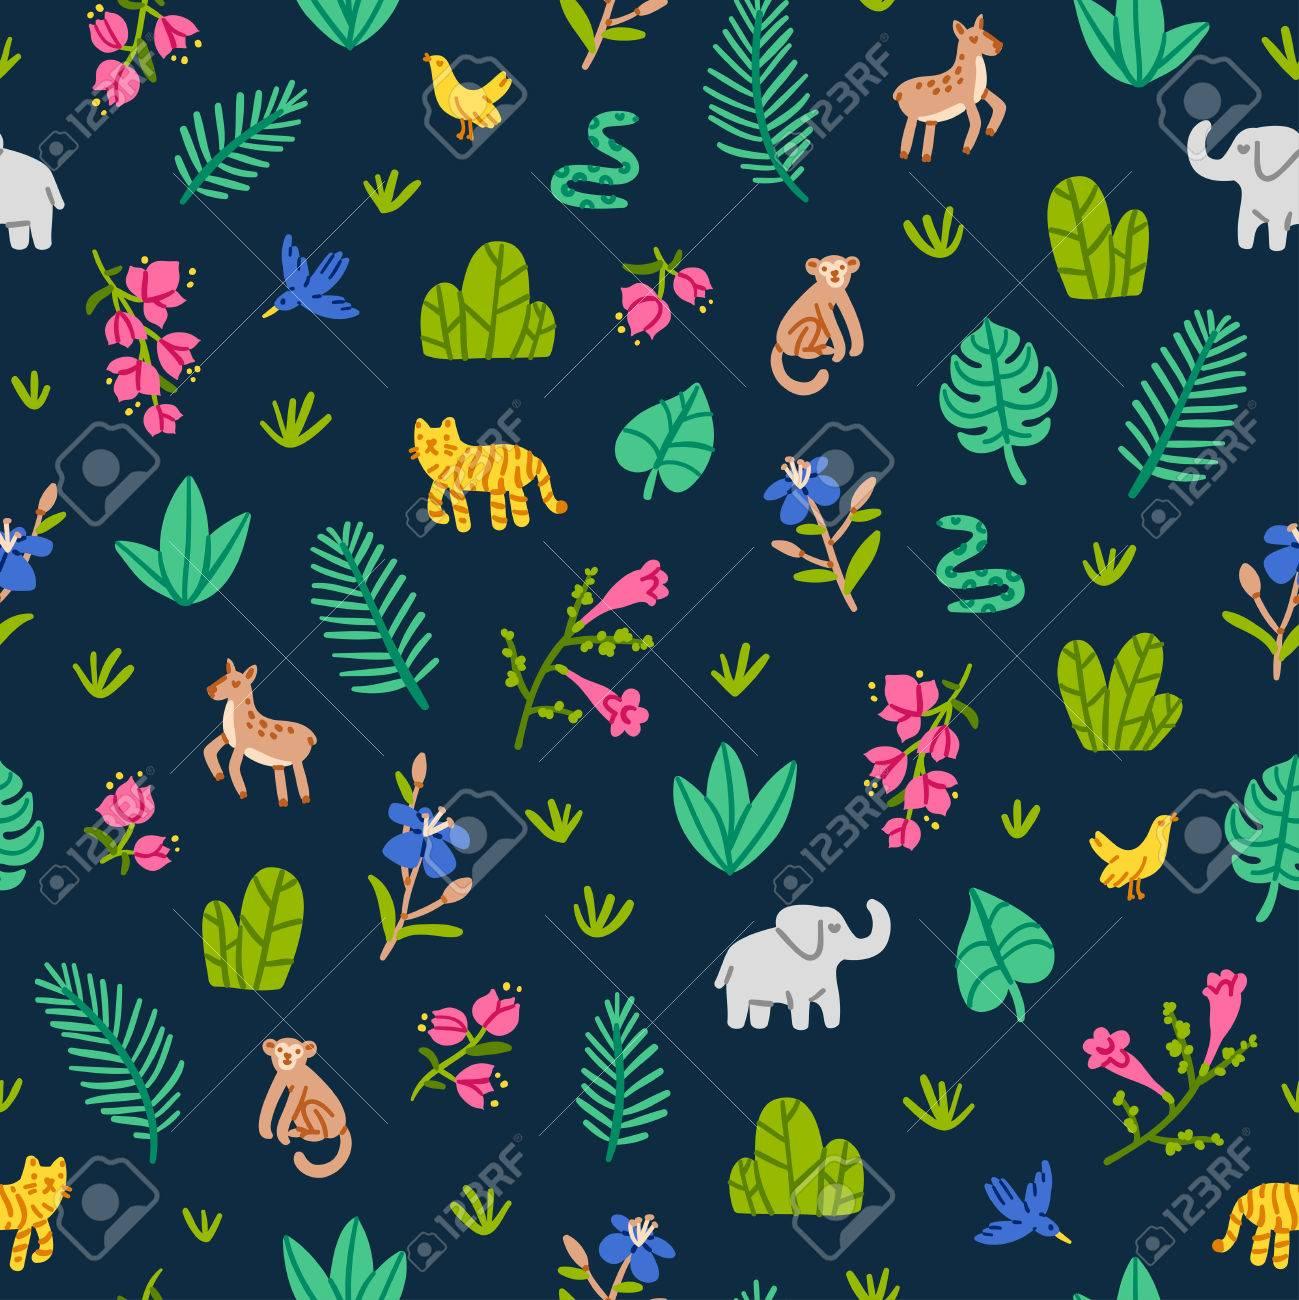 Jungle wildlife nature seamless pattern - 51375970